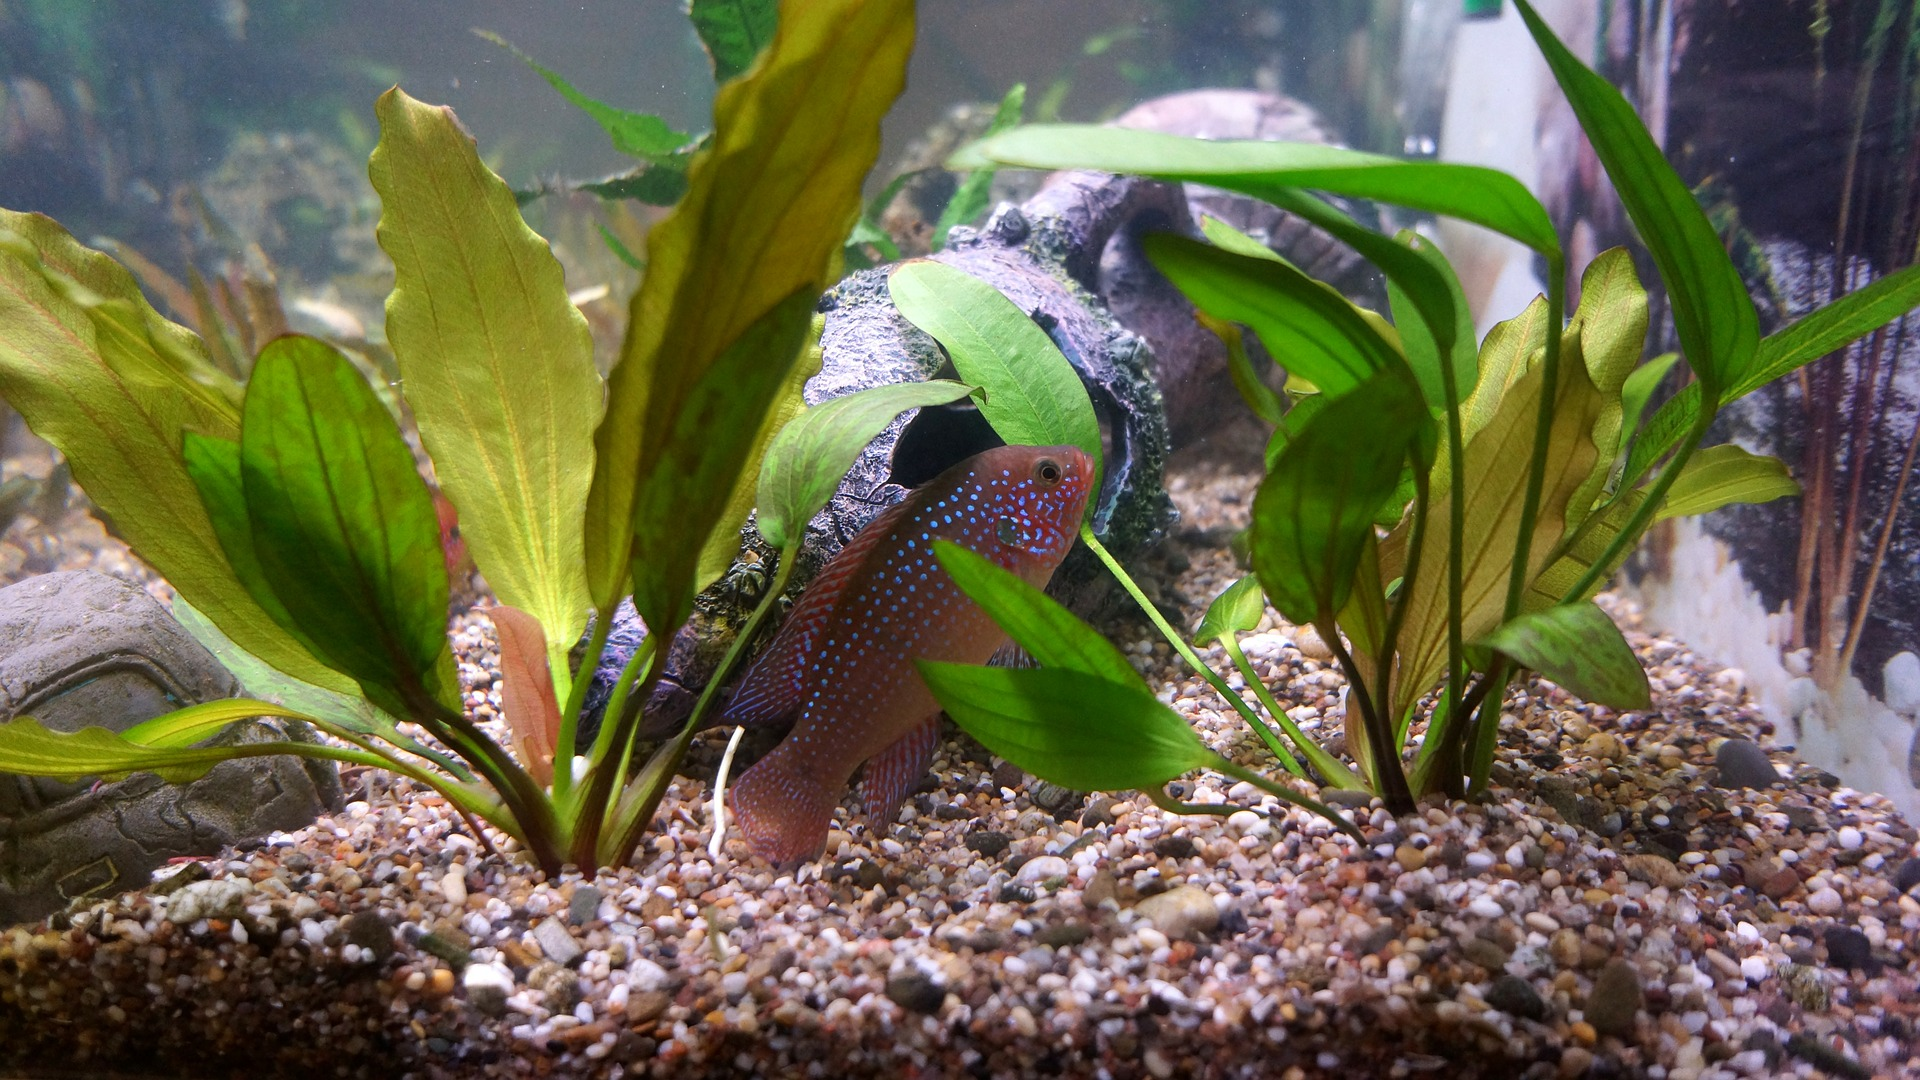 Samotna ryba